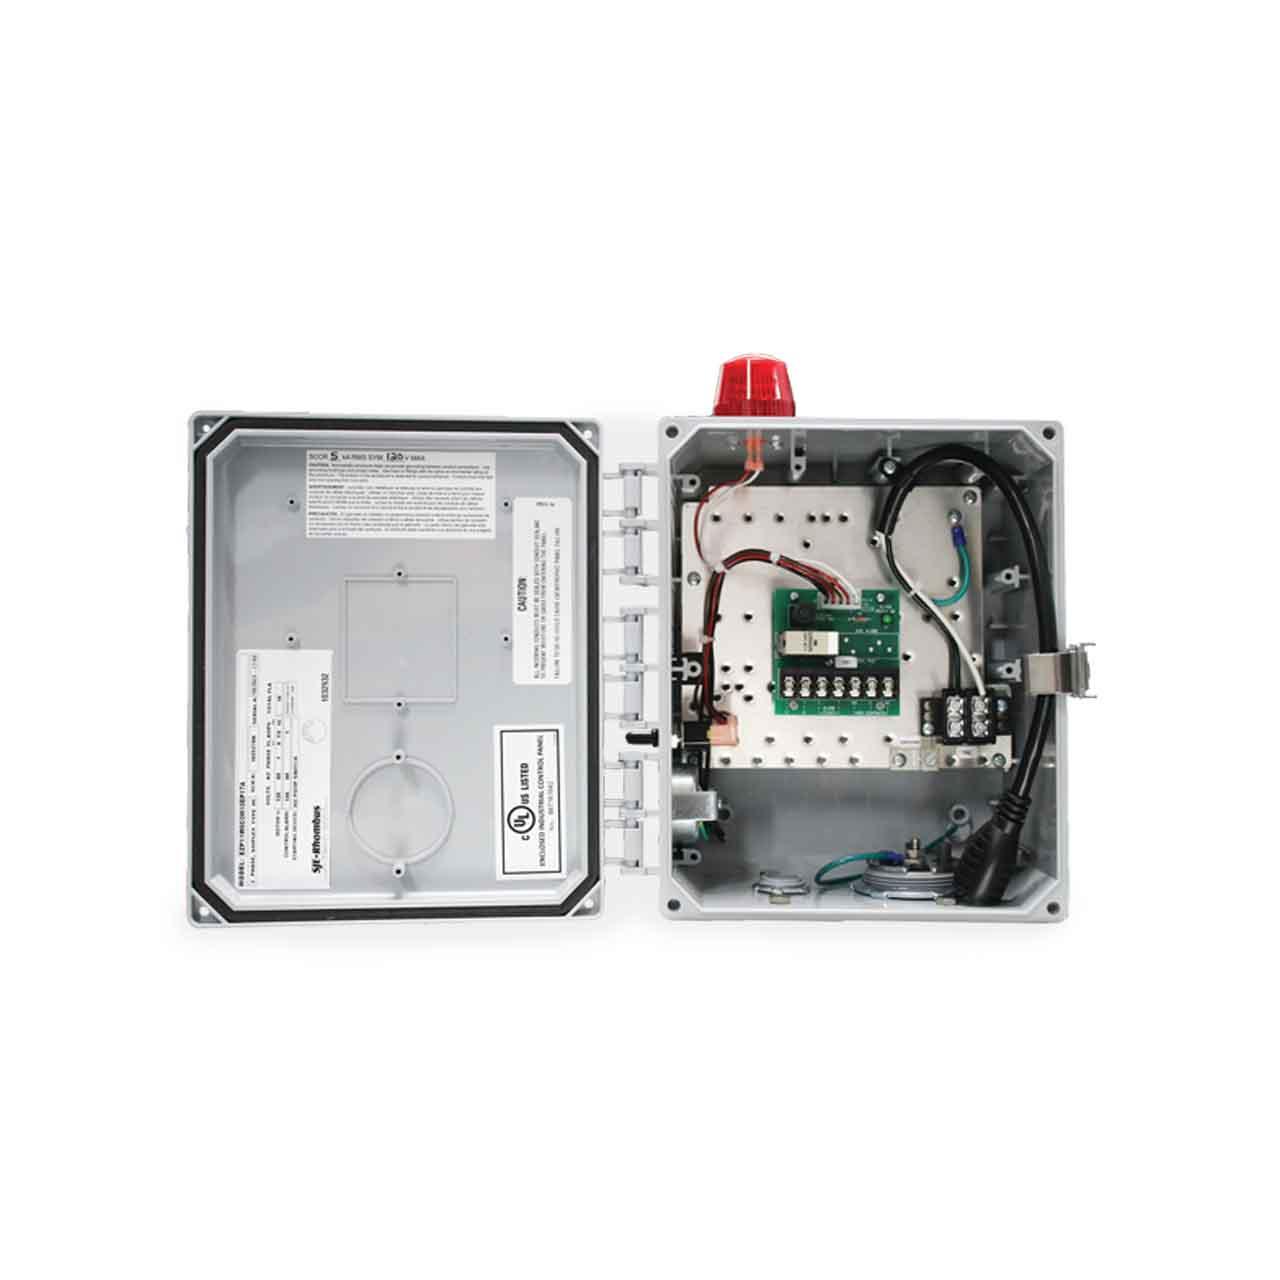 hight resolution of sje rhombus sje rhombus ezp series plugger plug in pump control rhombus septic control wiring diagram